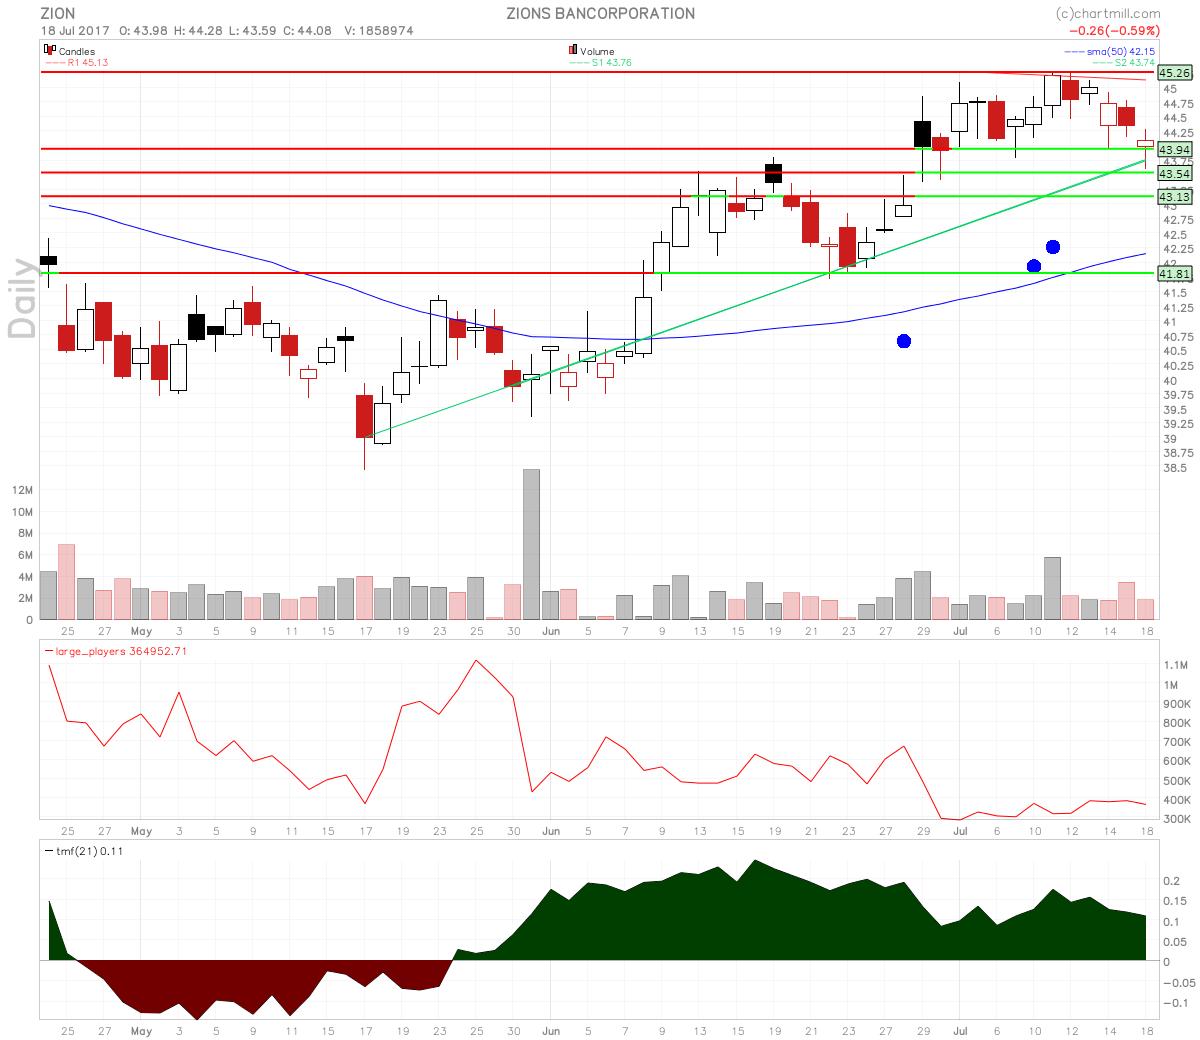 Zions Bancorporation Stock Swing Long Trade Setup